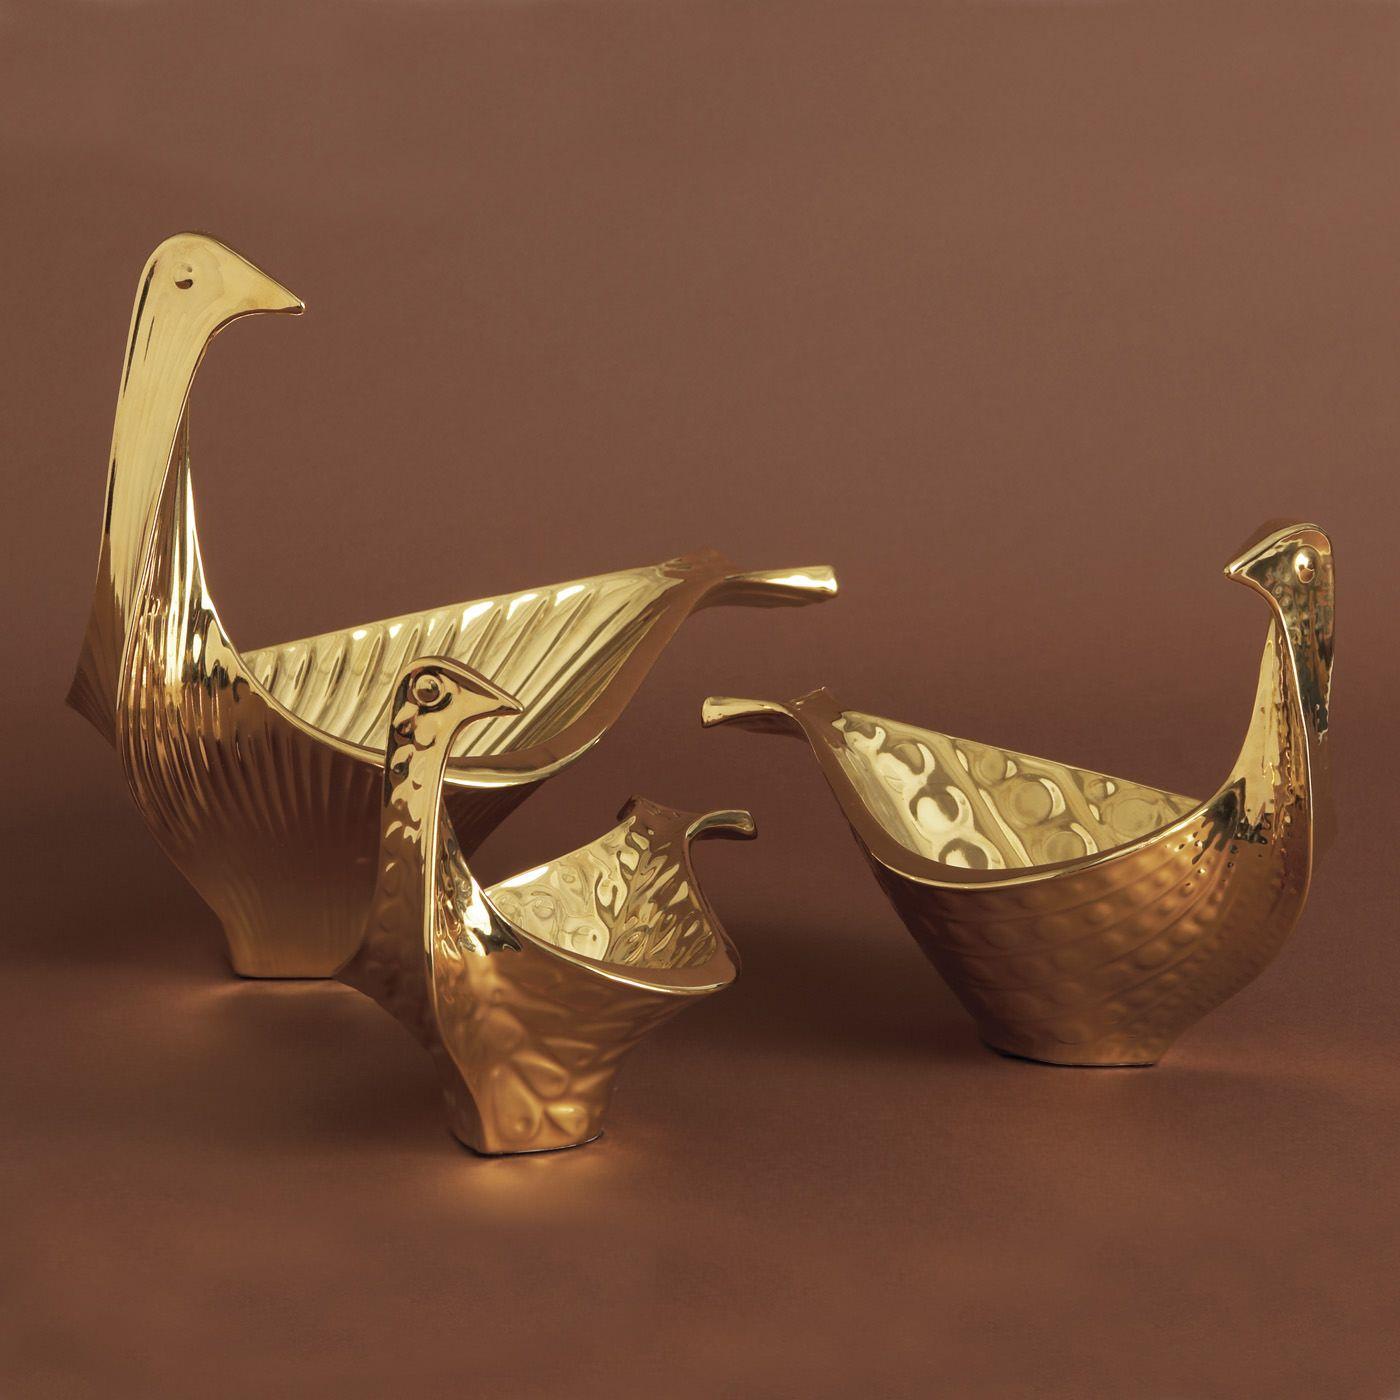 Small Gold Glazed Ceramic Bird Bowl By Jonathan Adler